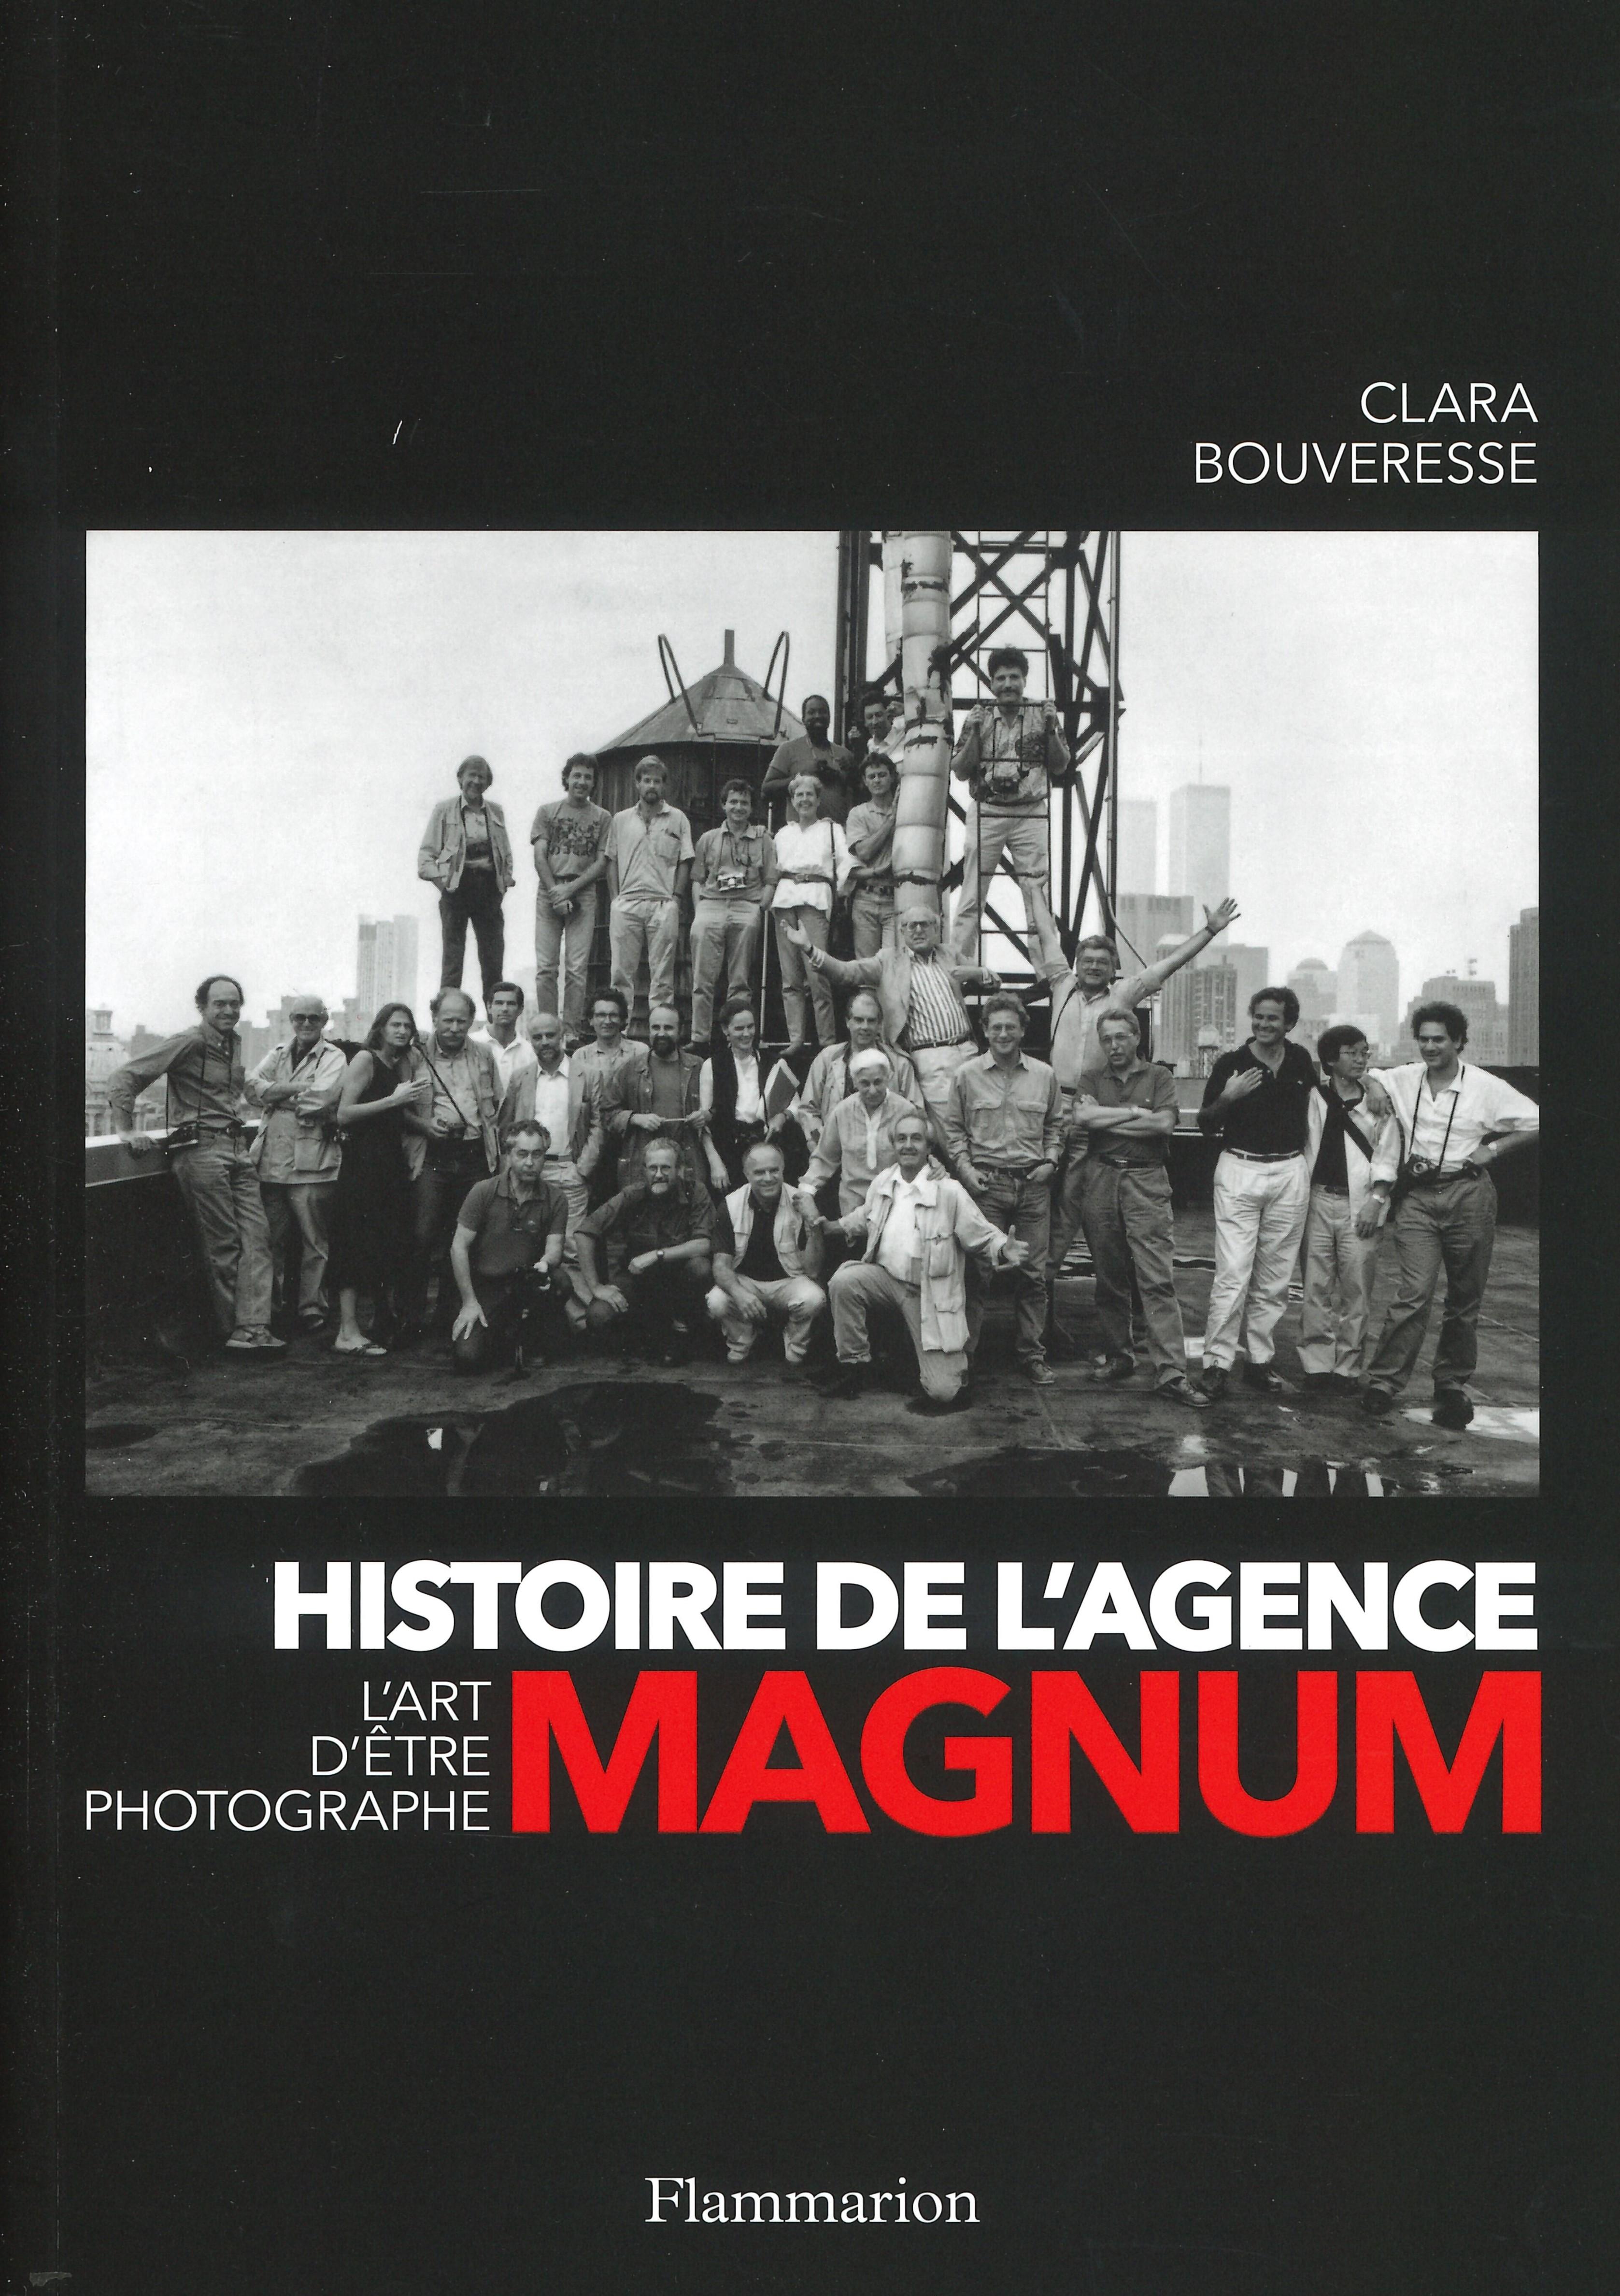 histoire_de_lagende_magnum.jpg